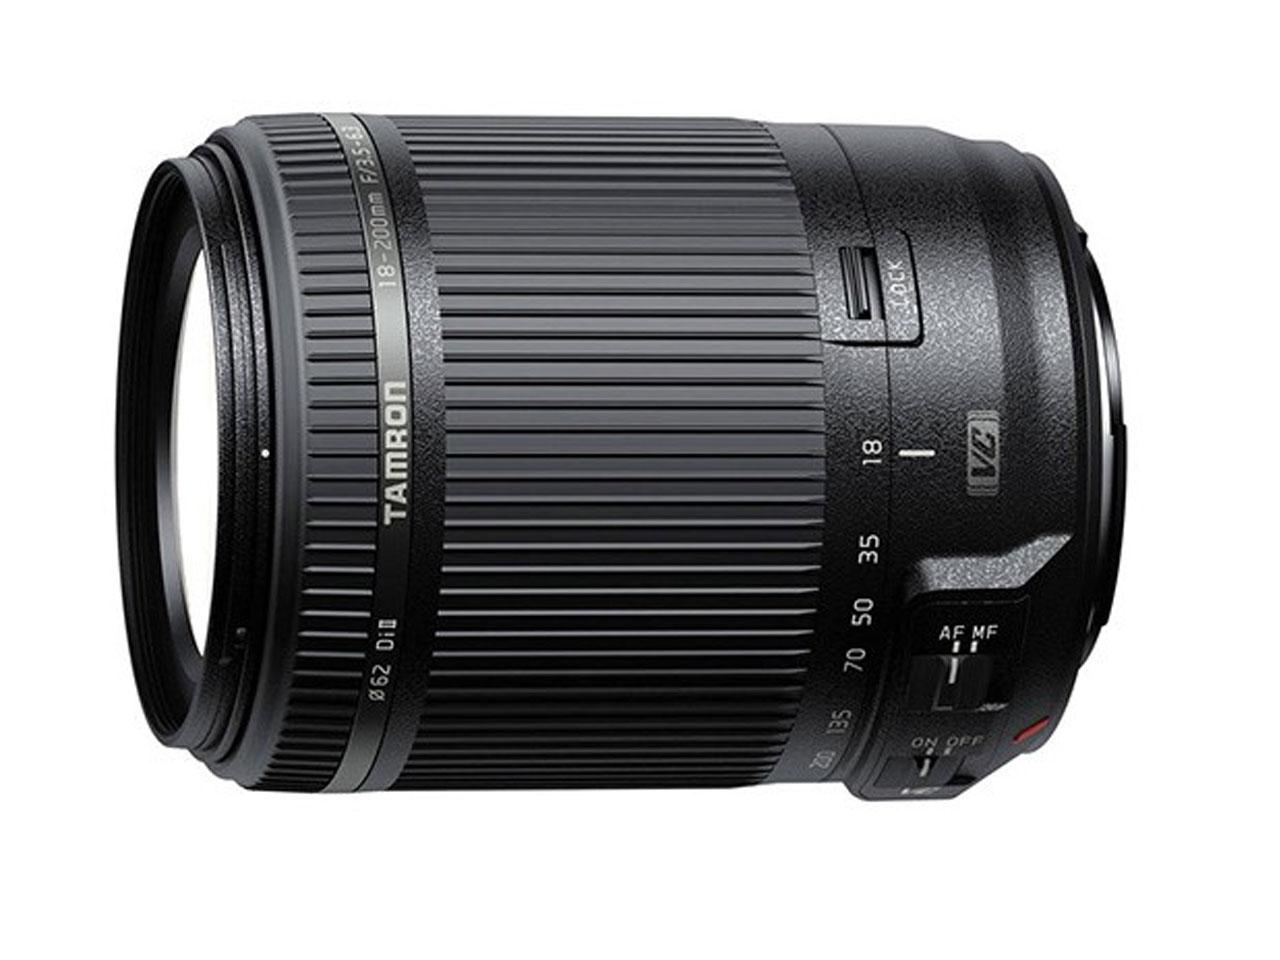 TAMRON AF 18-200 mm F/3.5-6.3 Di II VC pro Nikon